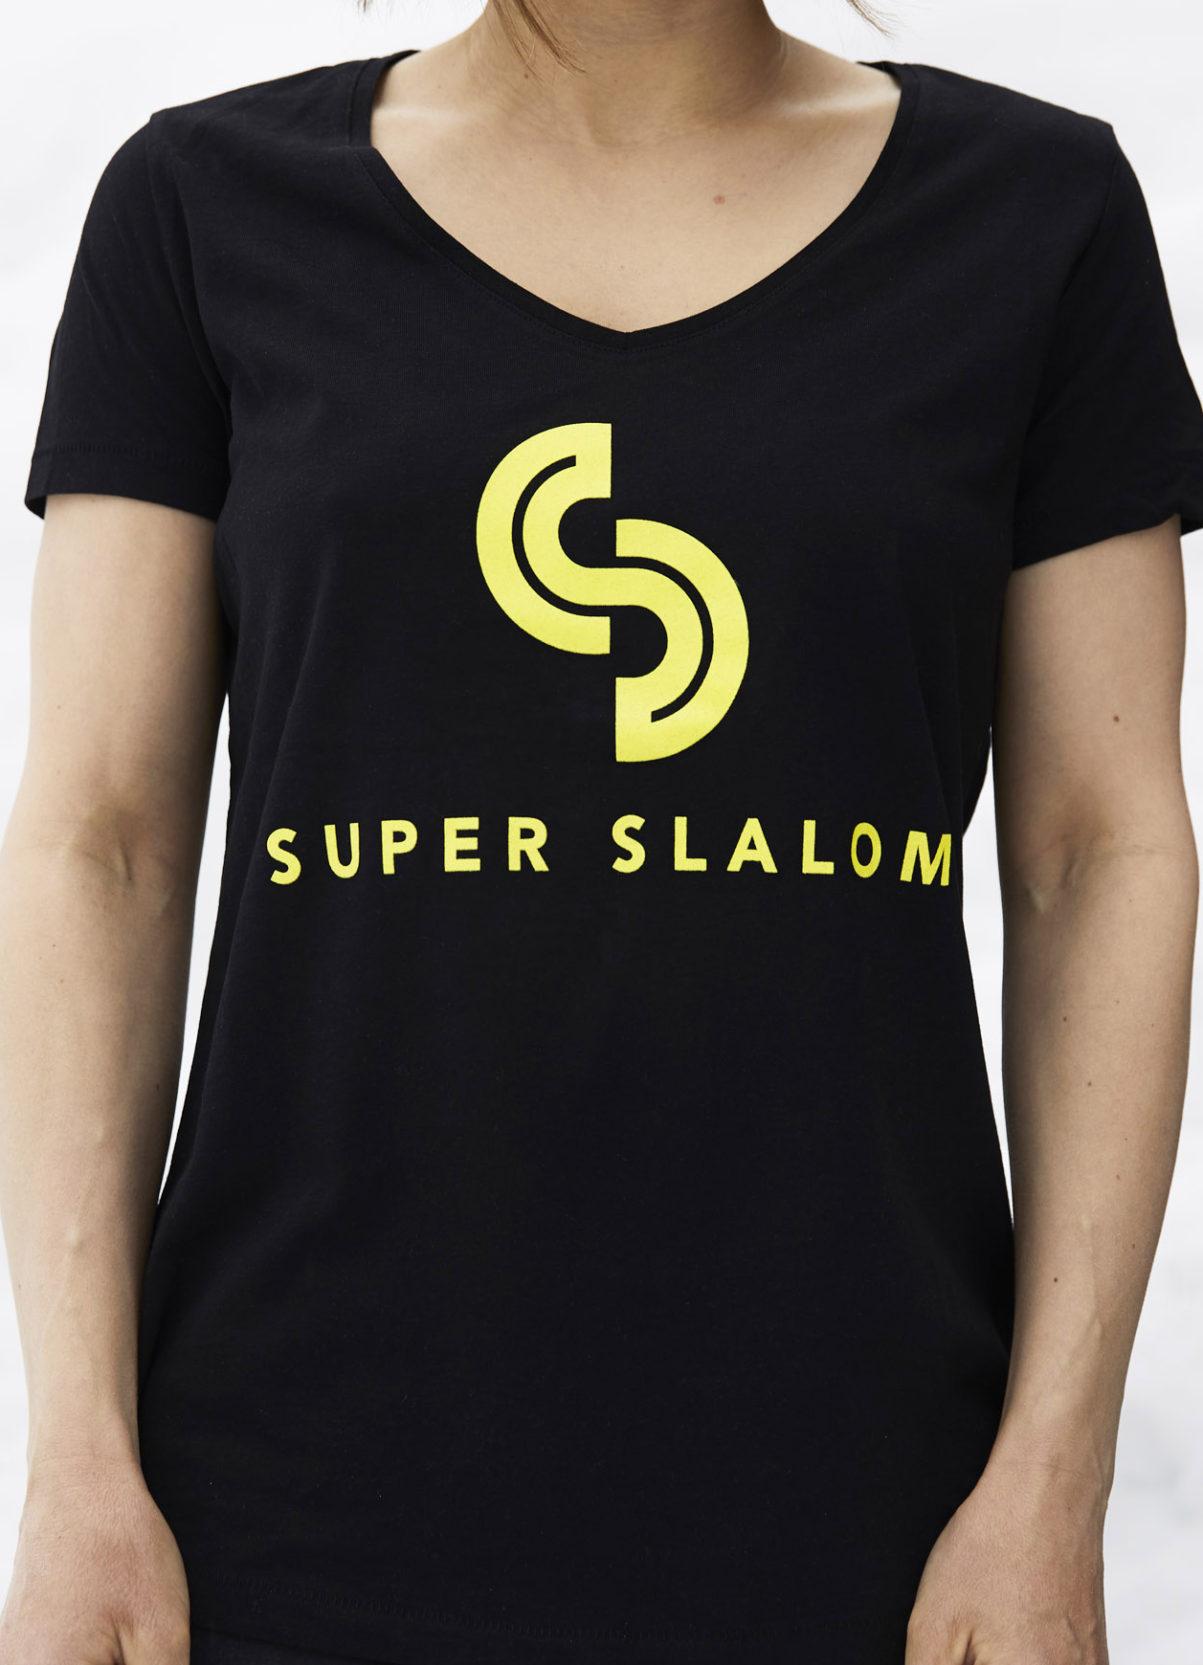 Tshirt-SS-femme_3 (1)